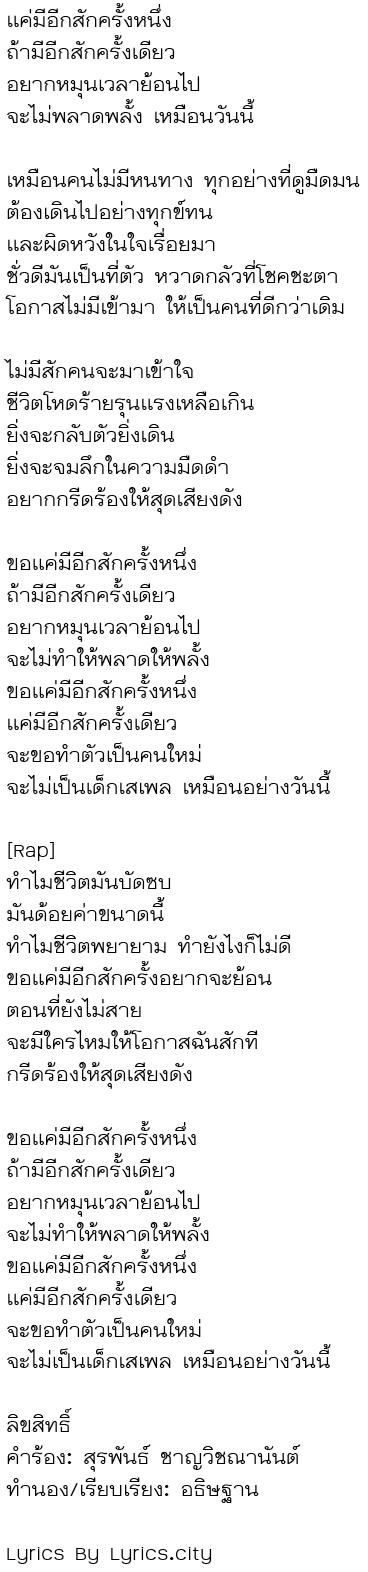 https://twitter.com/eFinanceThai/status/1263691668936552449